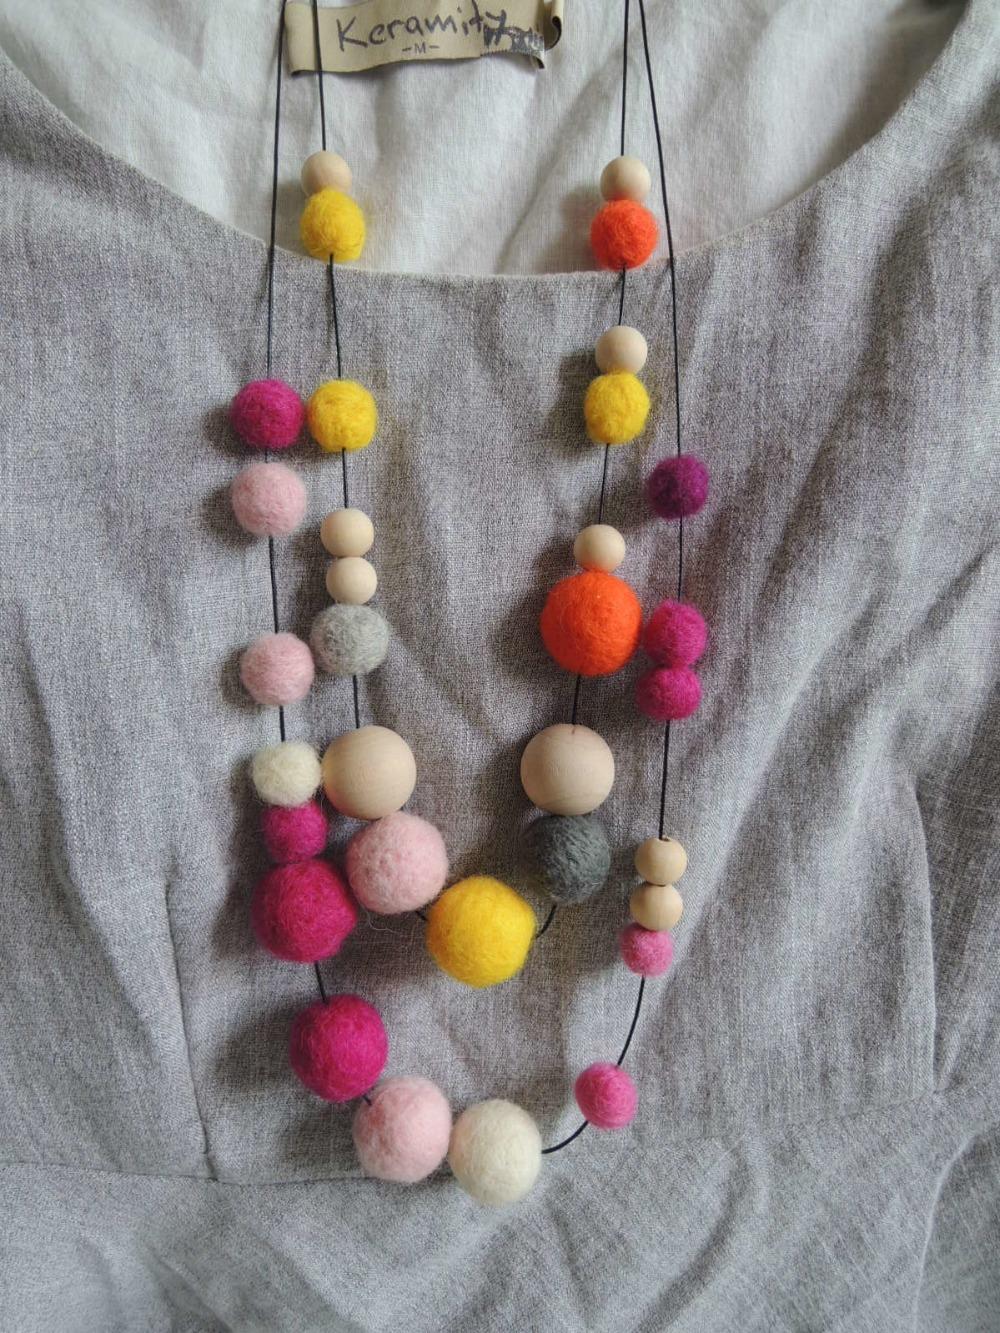 Felt necklace ball beaded assorted design felt ball wooden beaded necklace free design NW1717(China (Mainland))